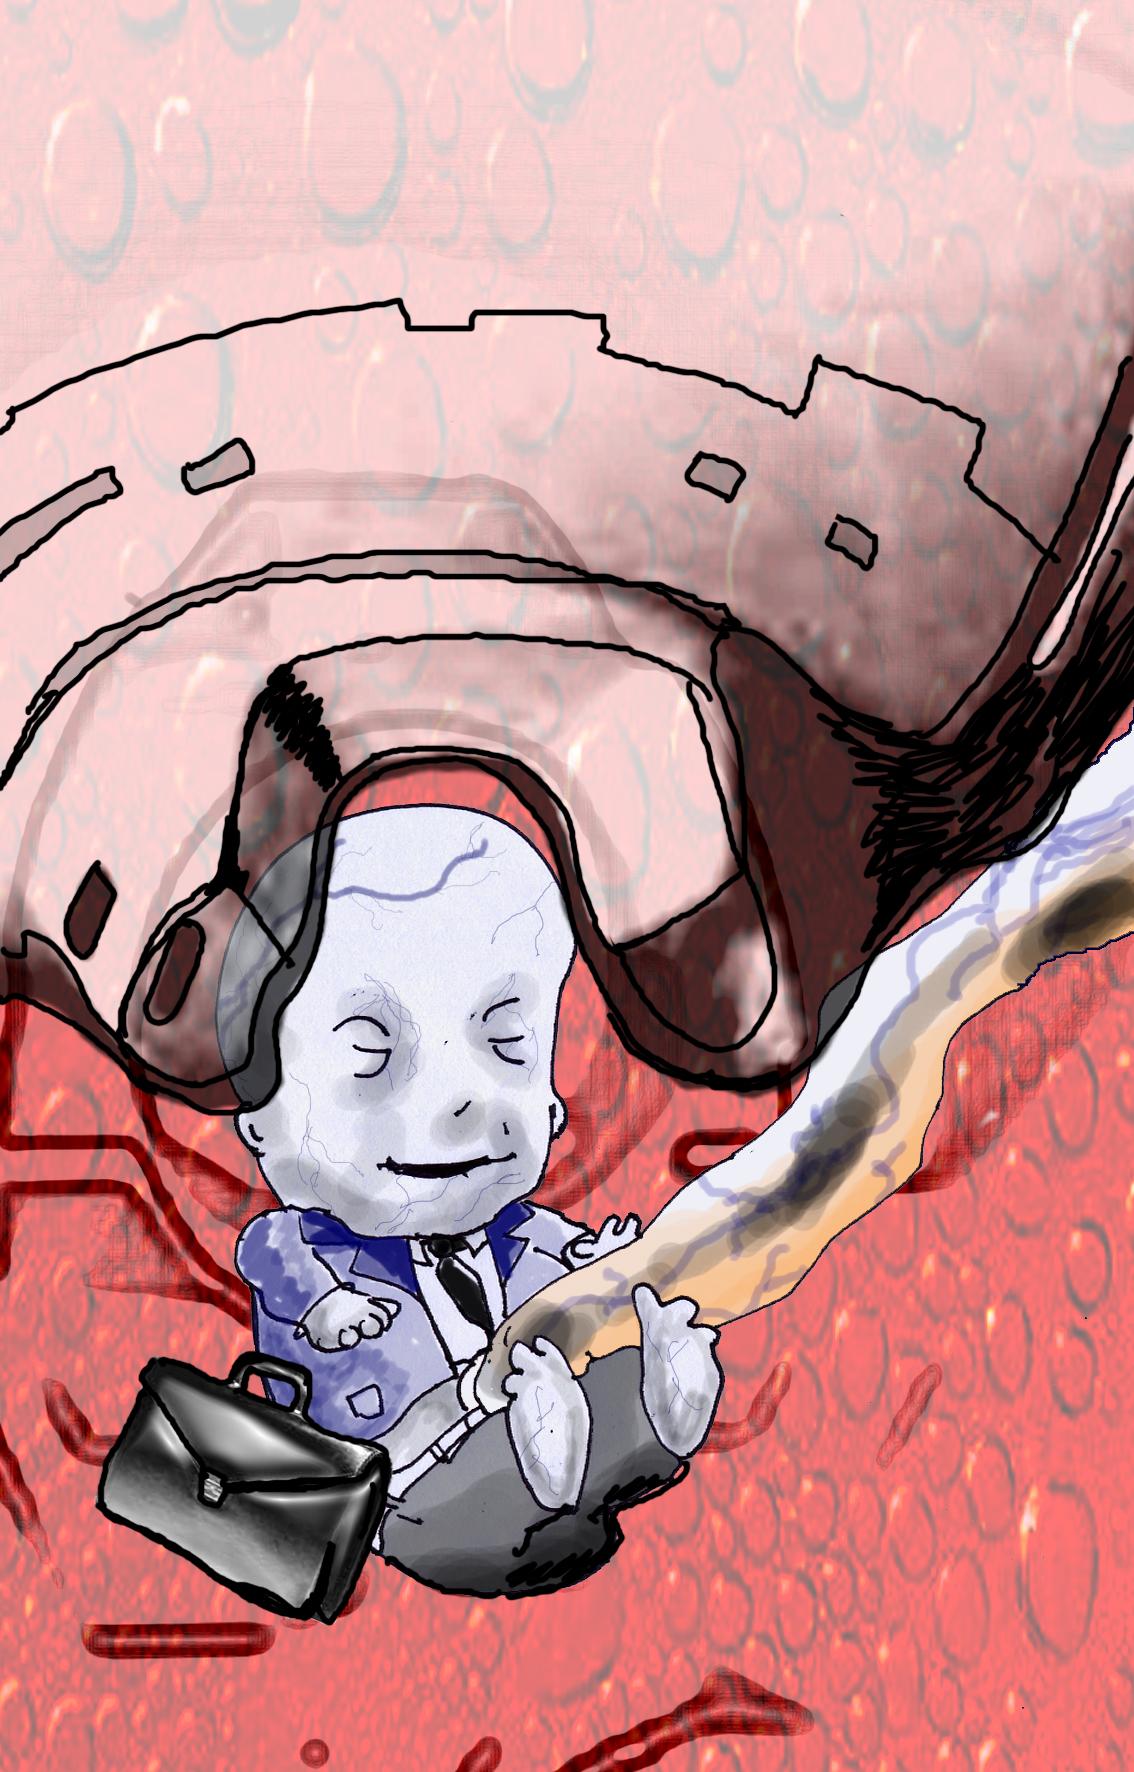 Illustration for a Scifi short story